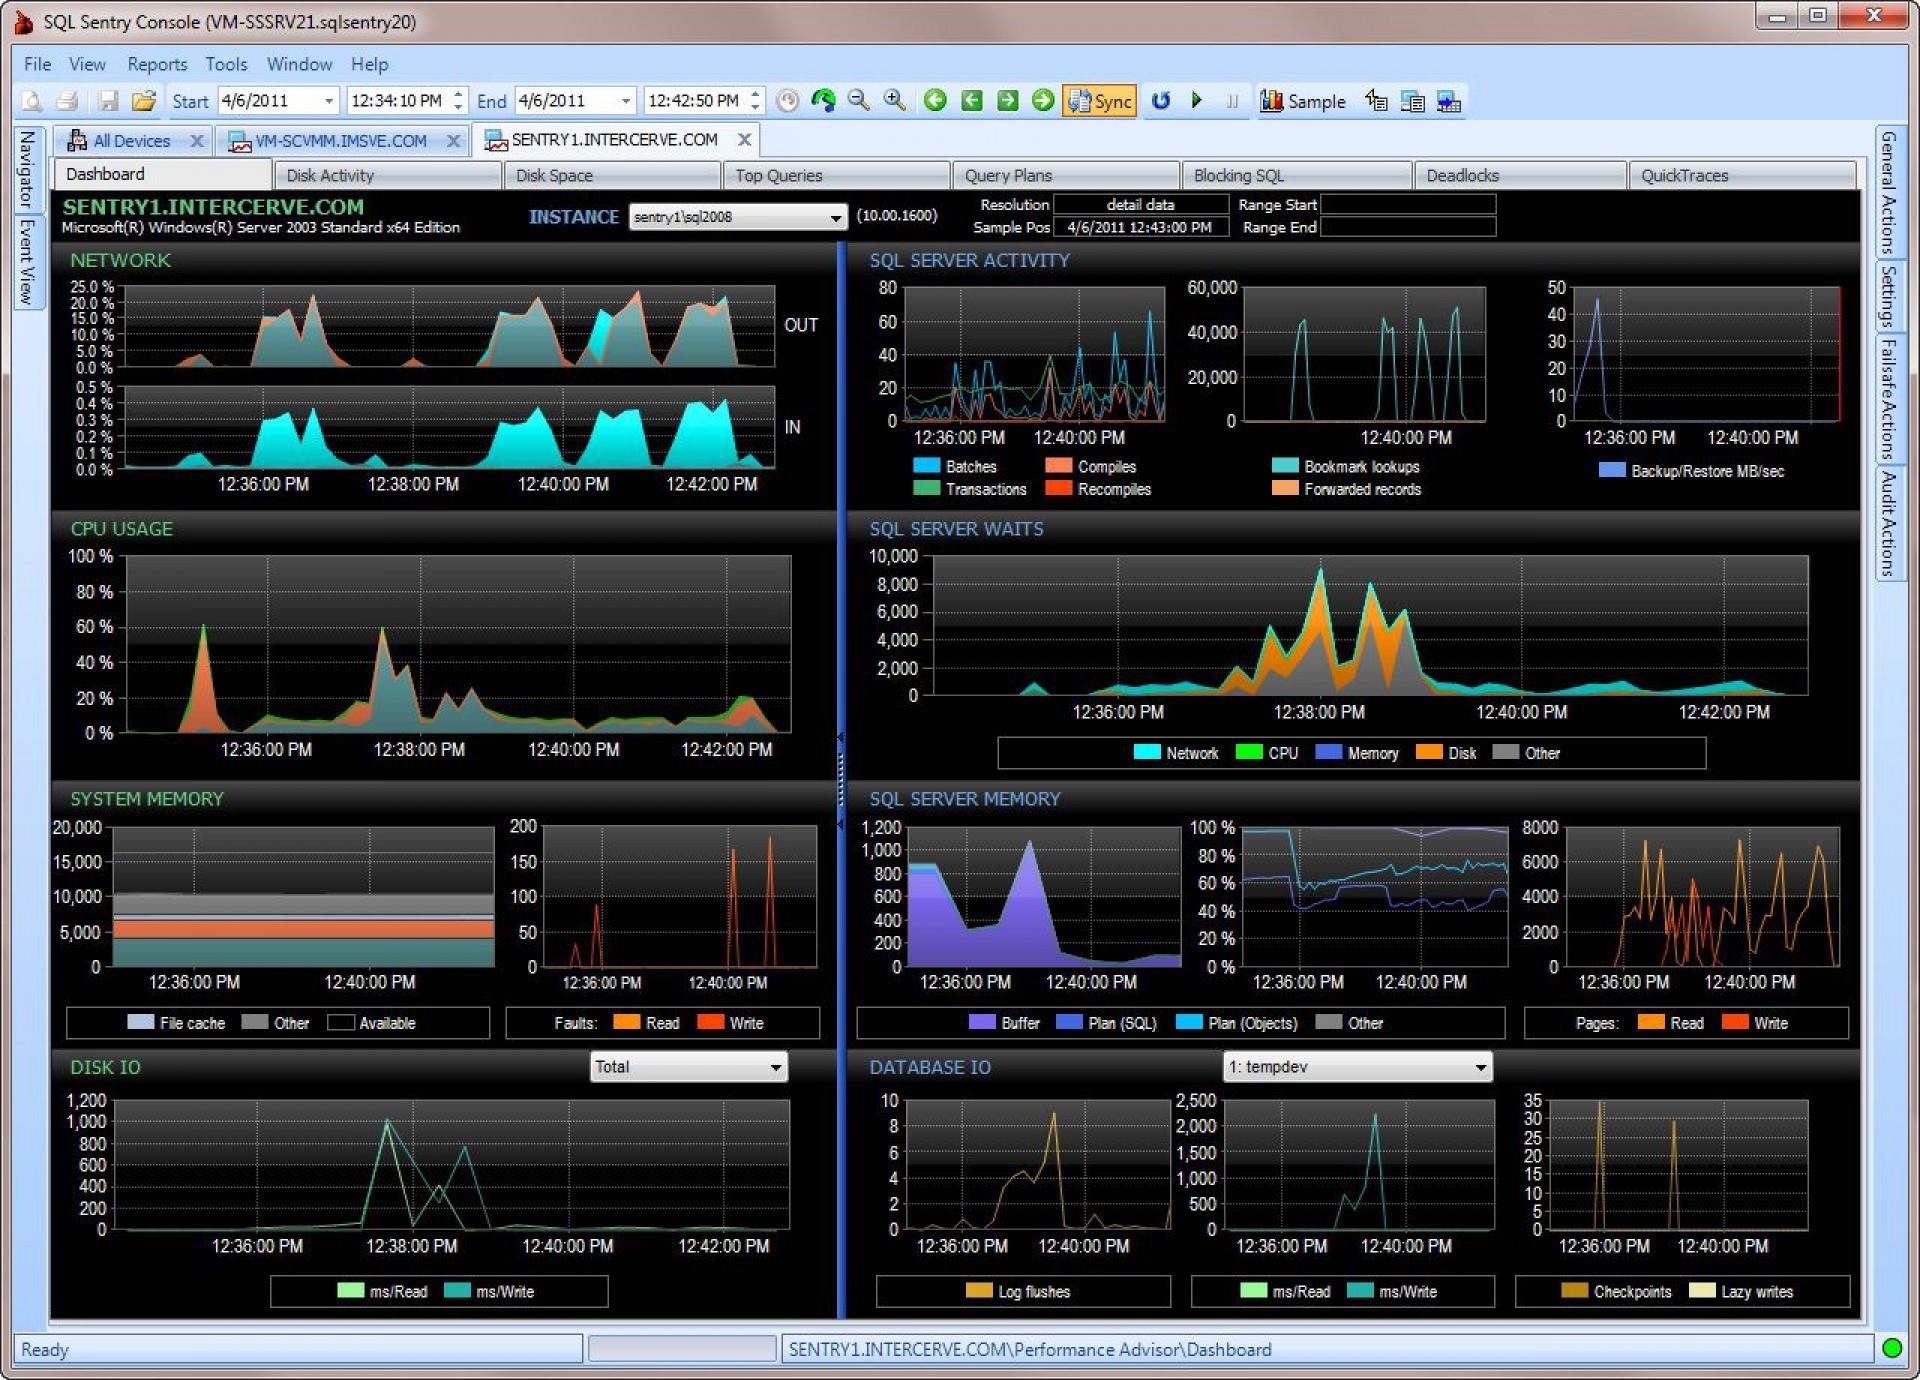 001 Beautiful Excel Dashboard Template Free Design  Sale Logistic Kpi Download Procurement1920